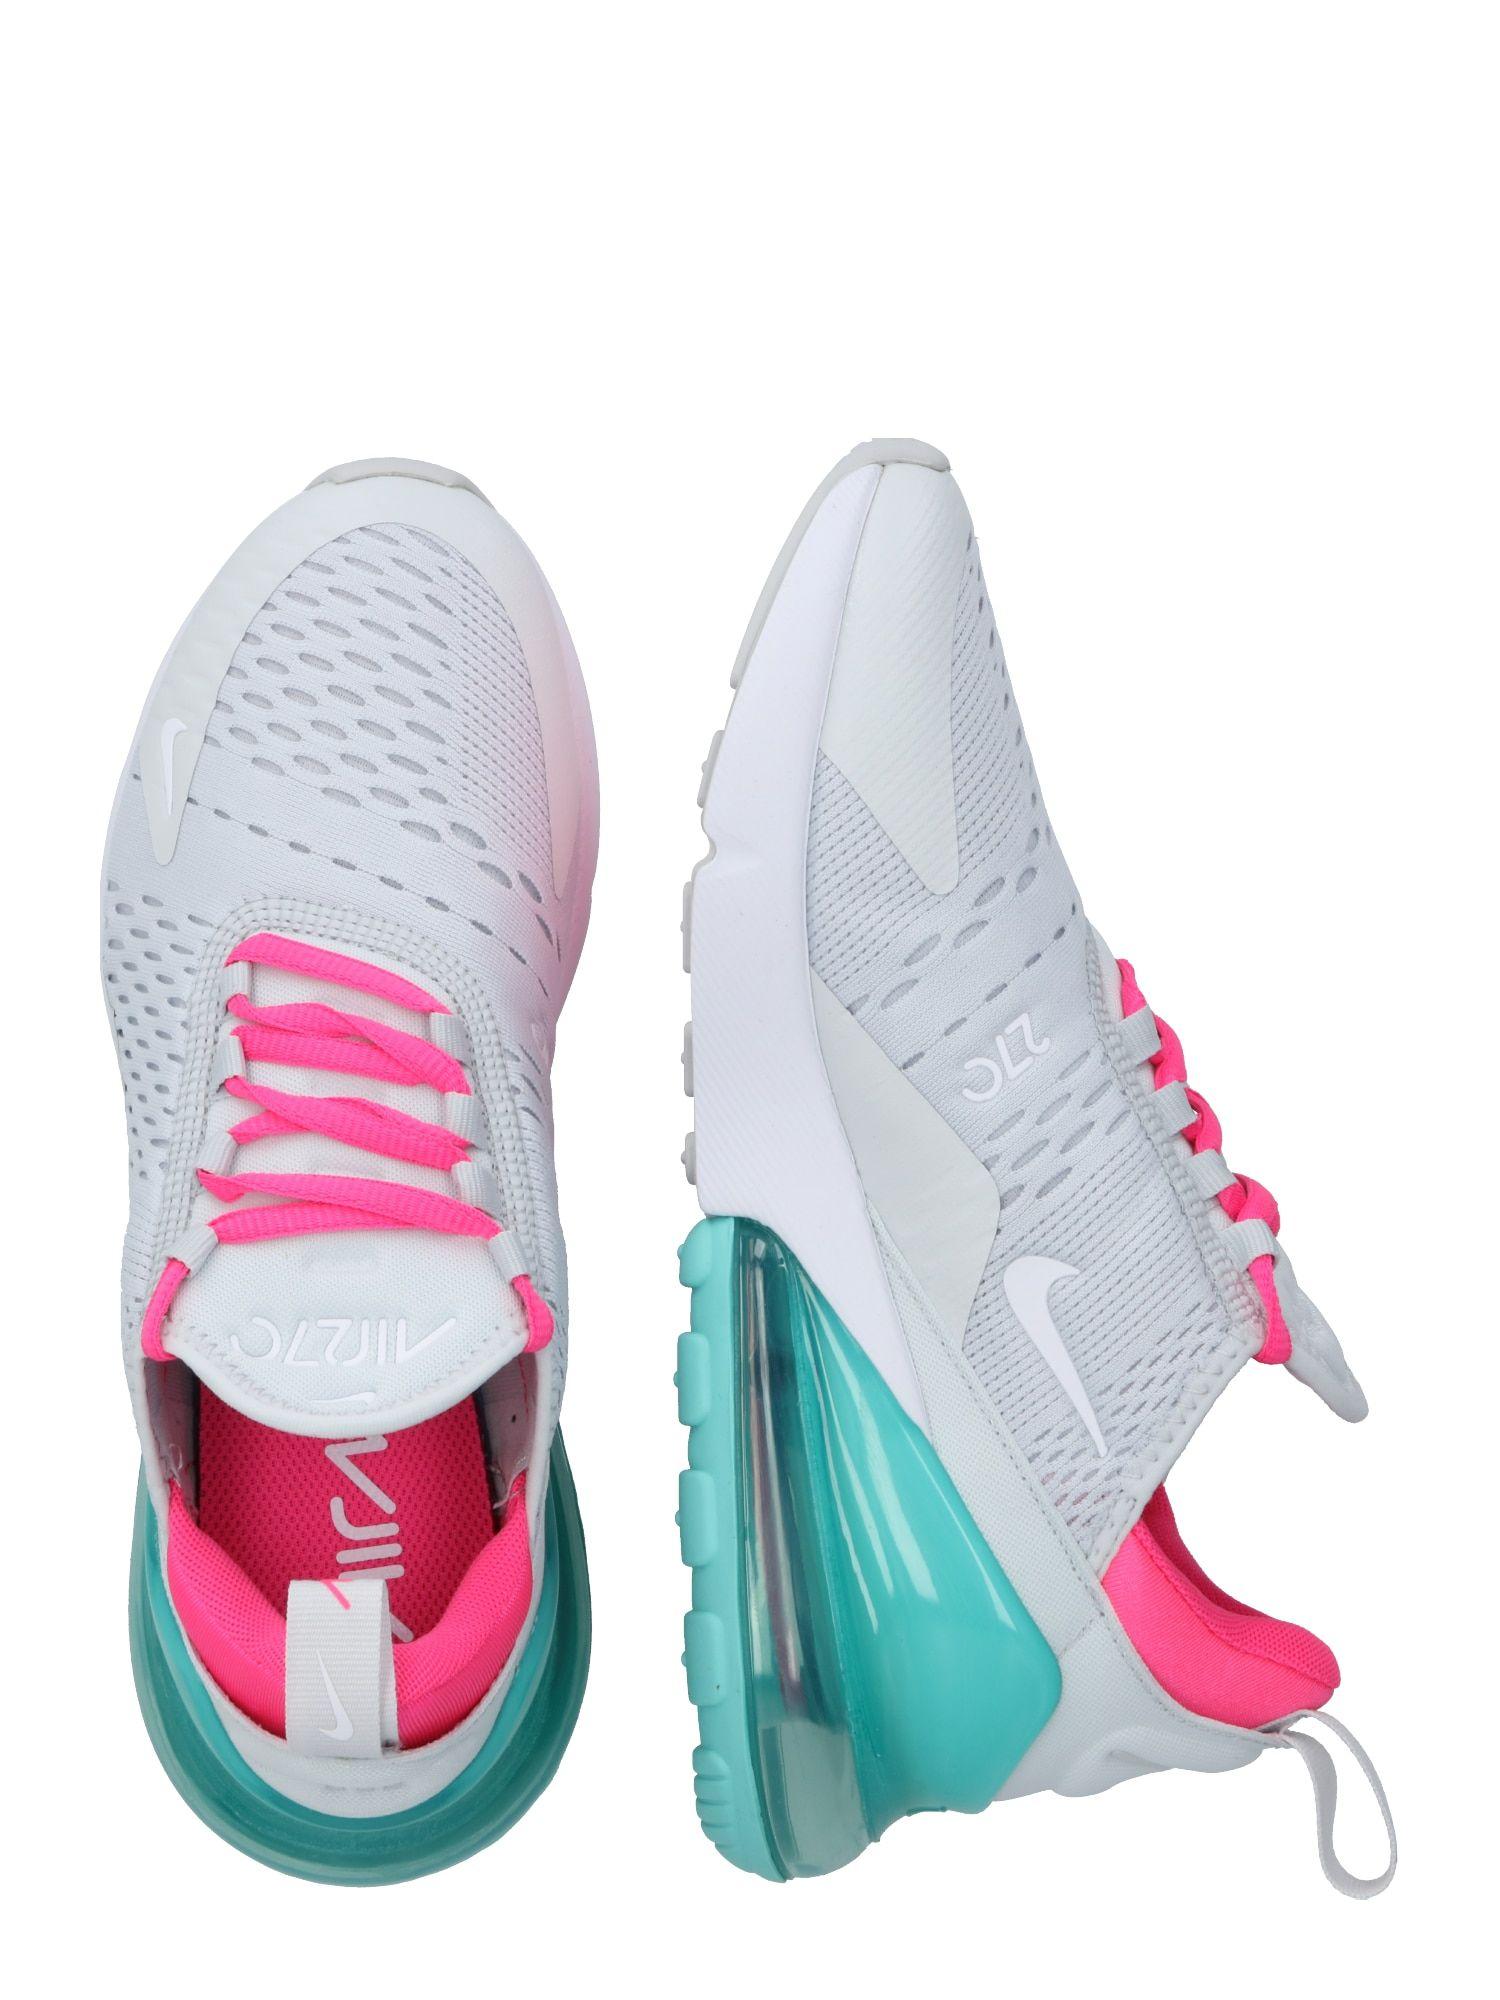 Nike Sportswear Sneaker Air Max 270 Damen Turkis Pink Weiss Grosse 40 5 Nike Sportswear Nike Und Damen